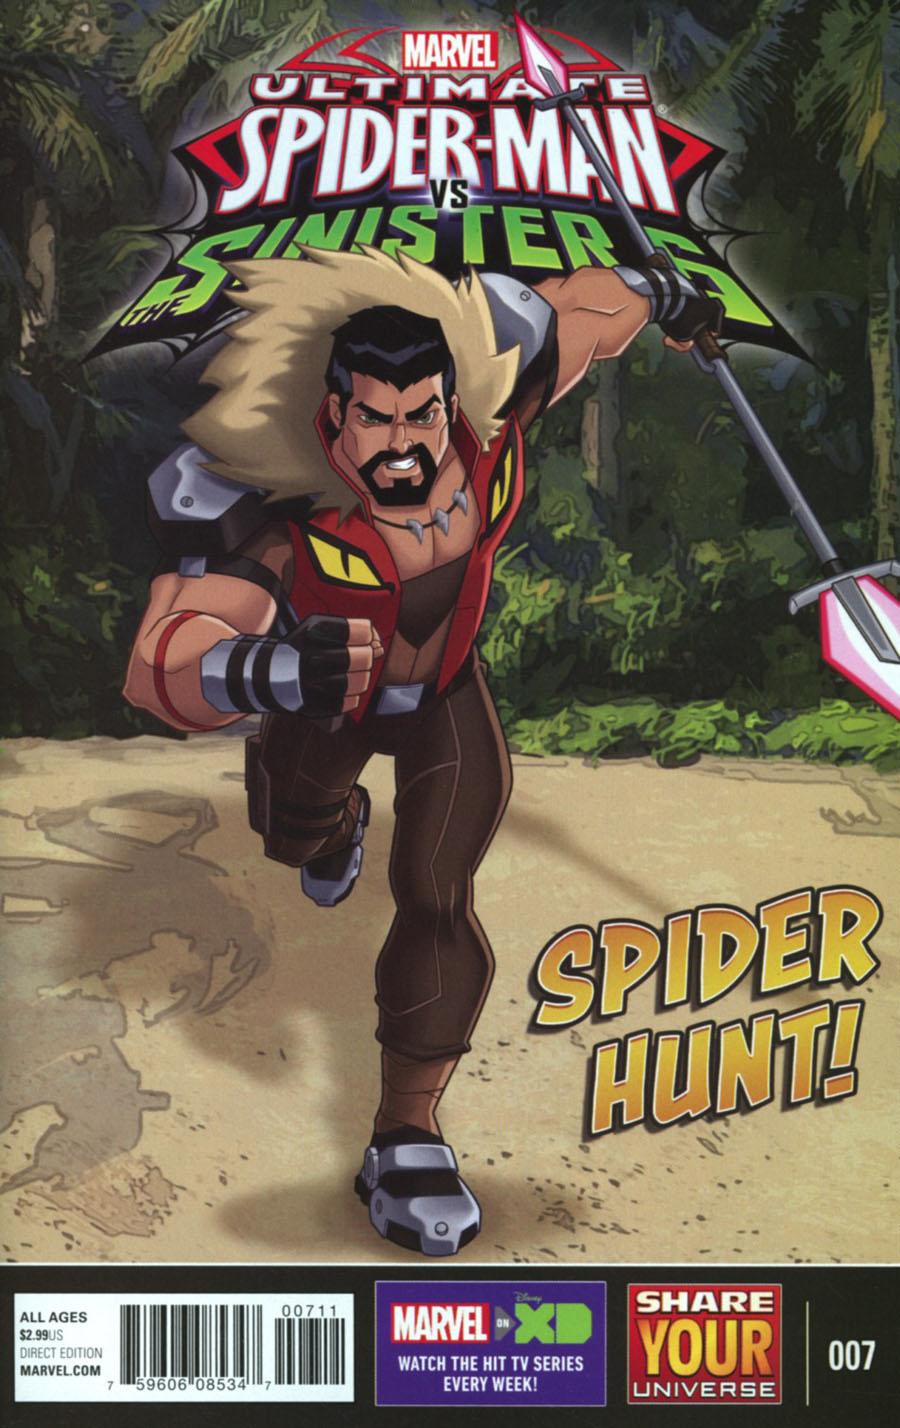 Marvel Universe Ultimate Spider-Man vs Sinister Six #7